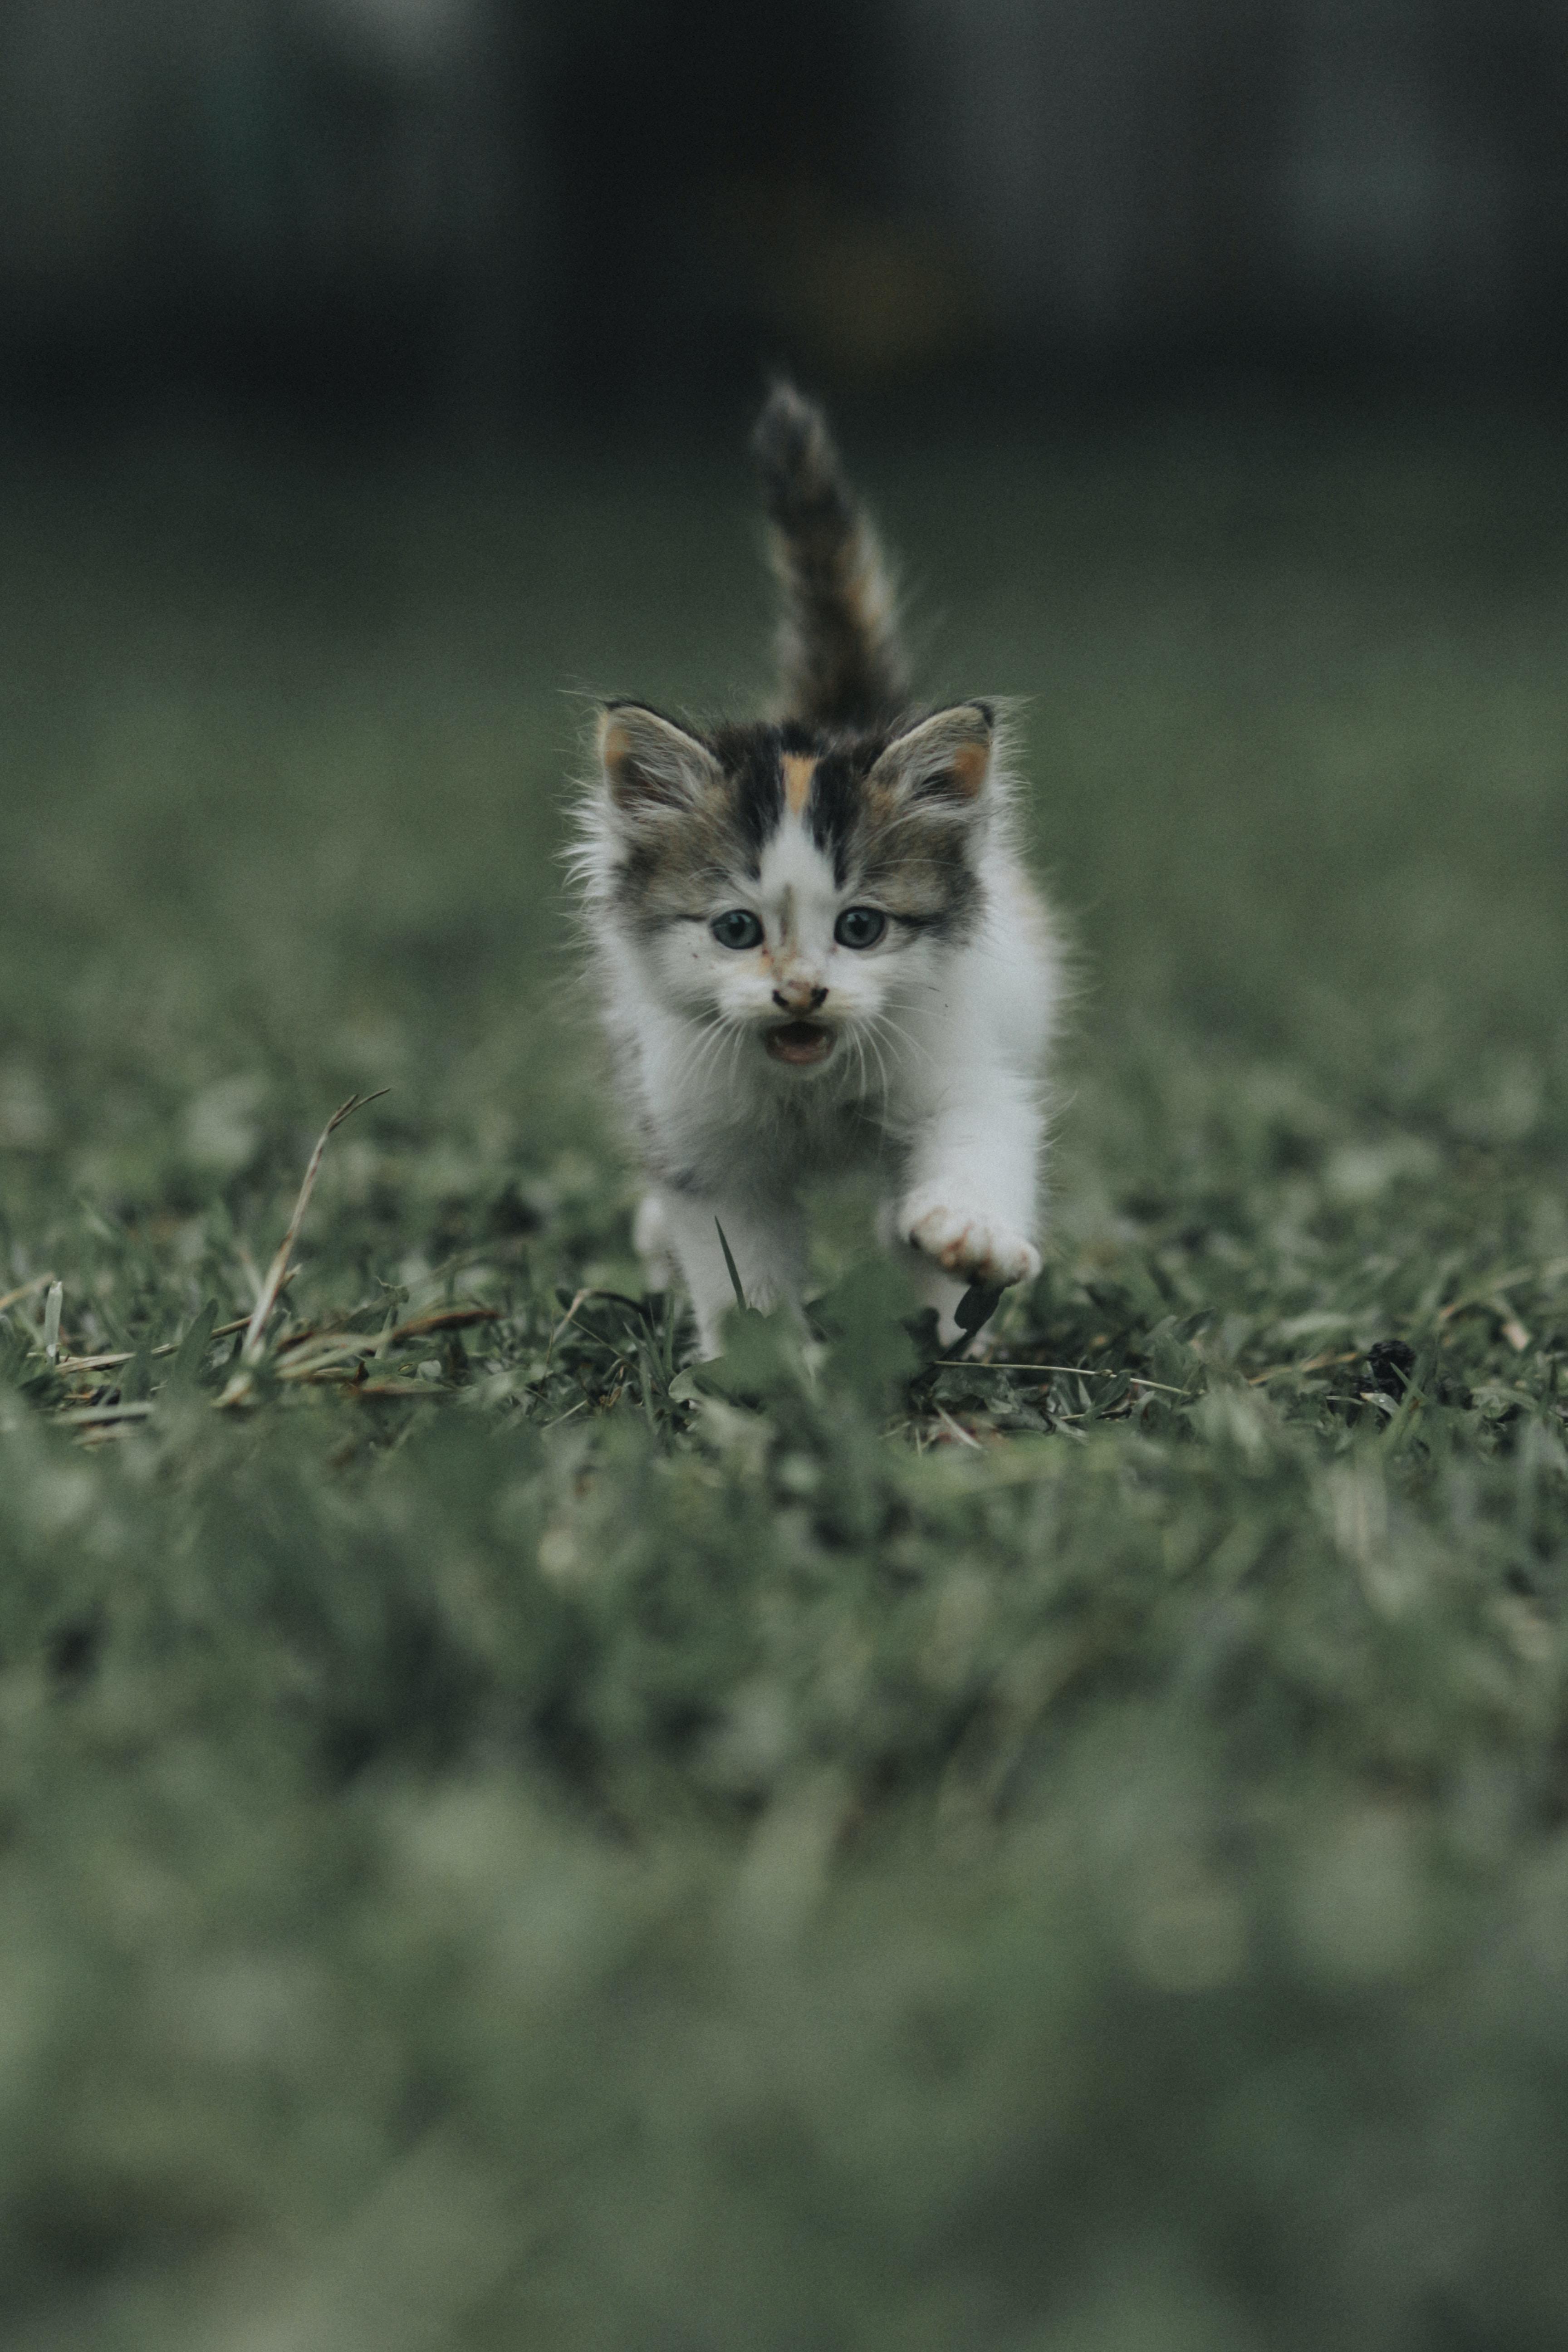 calico kitten on green grass